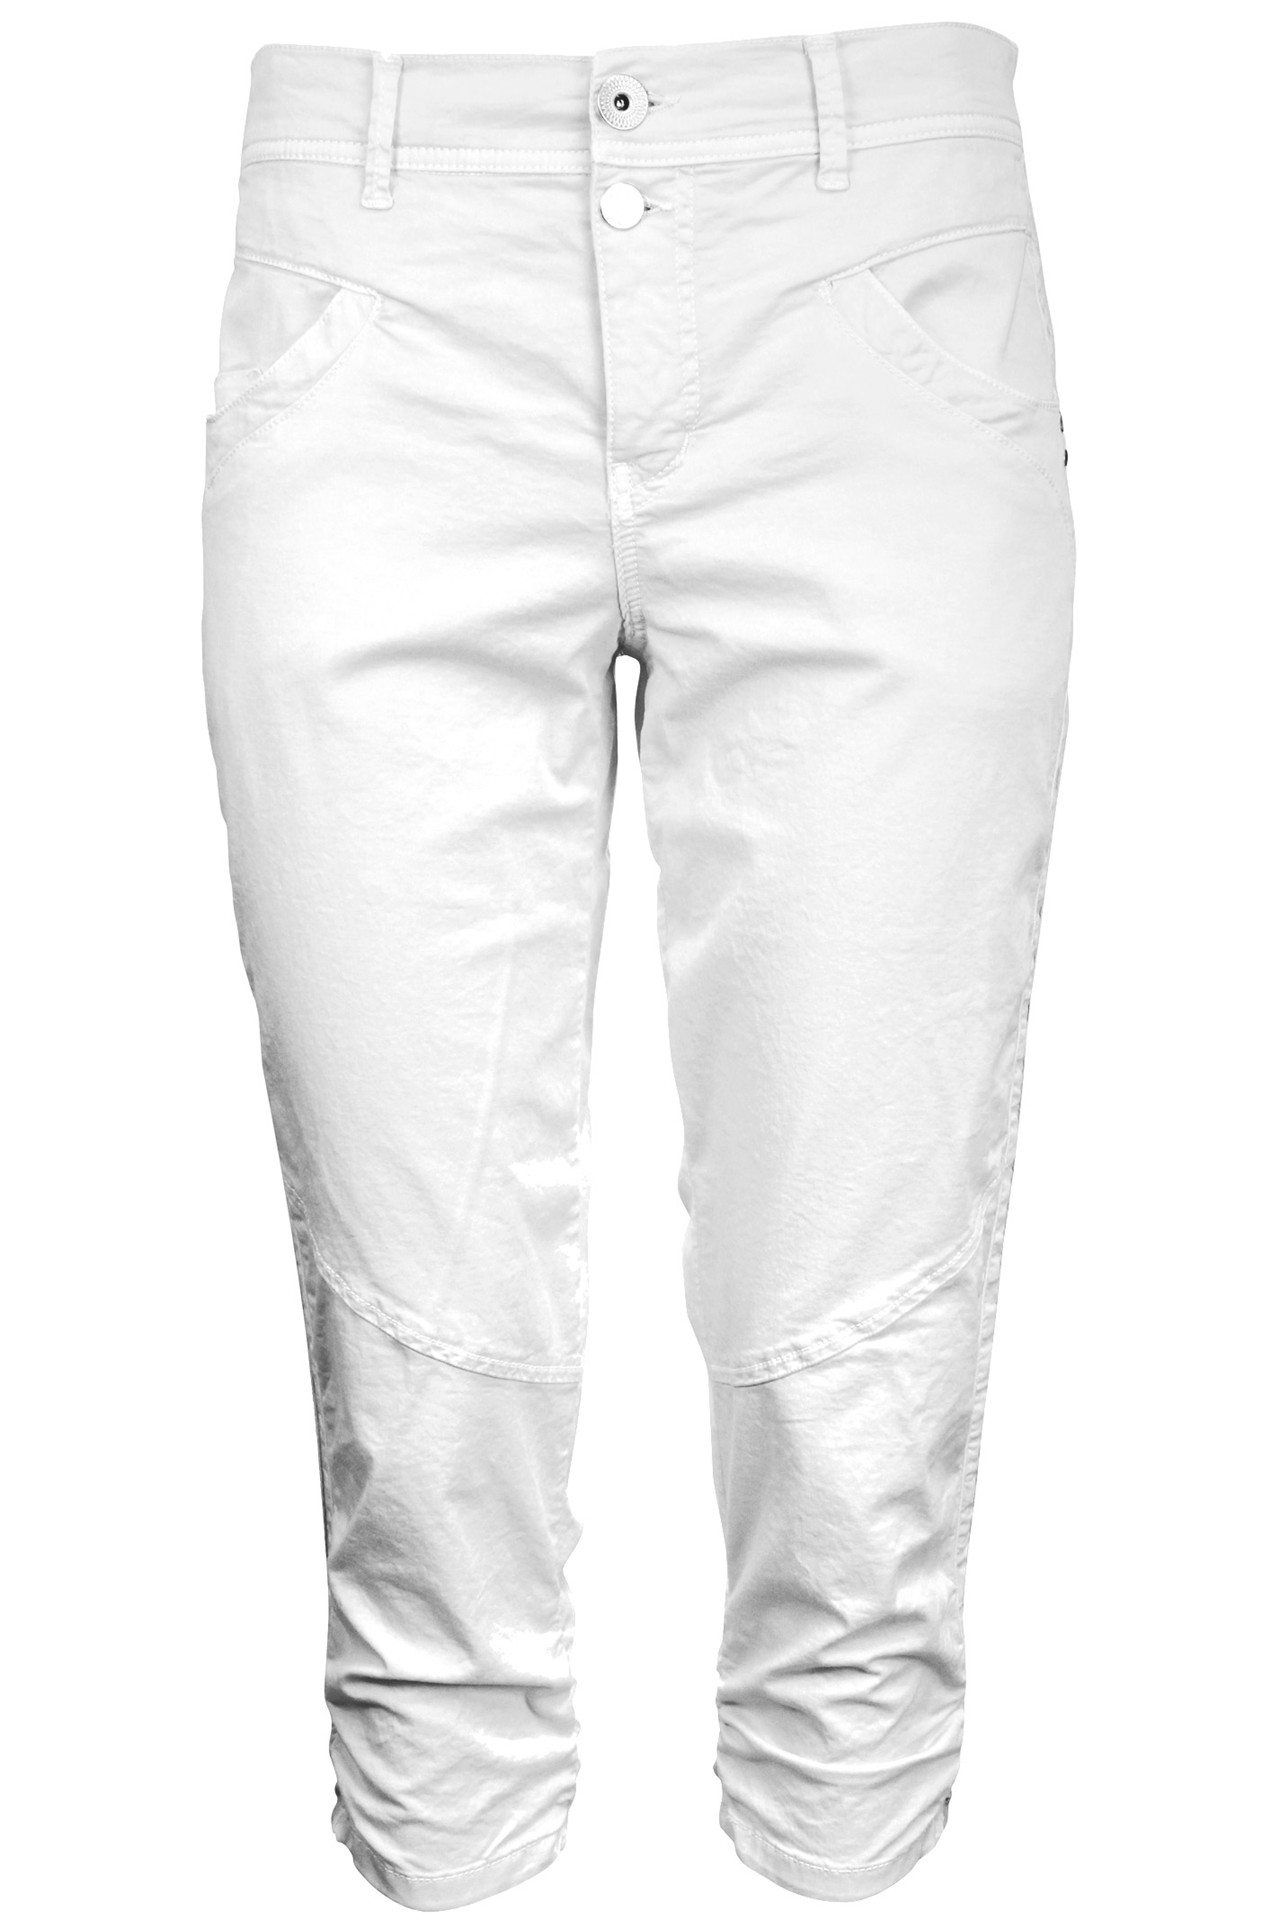 2 BIZ ADARABER White